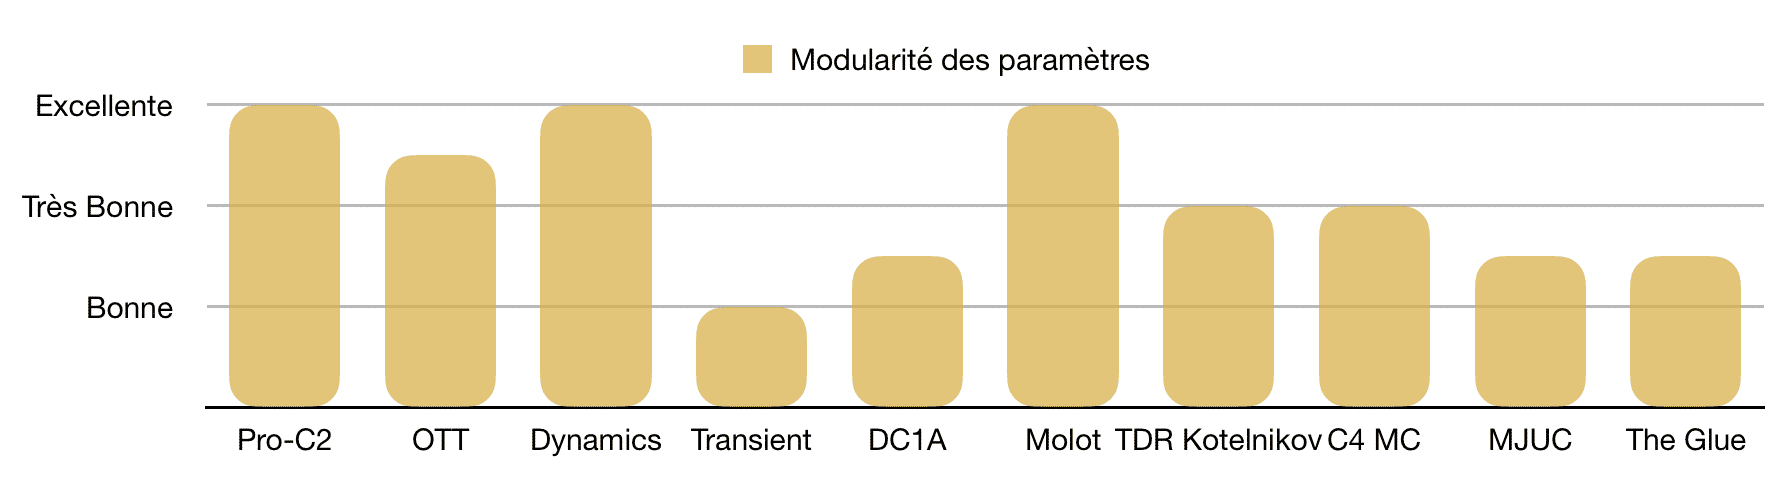 Modularité paramètres - TOP 10 - Plugins - Compresseurs - WE COMPOZE